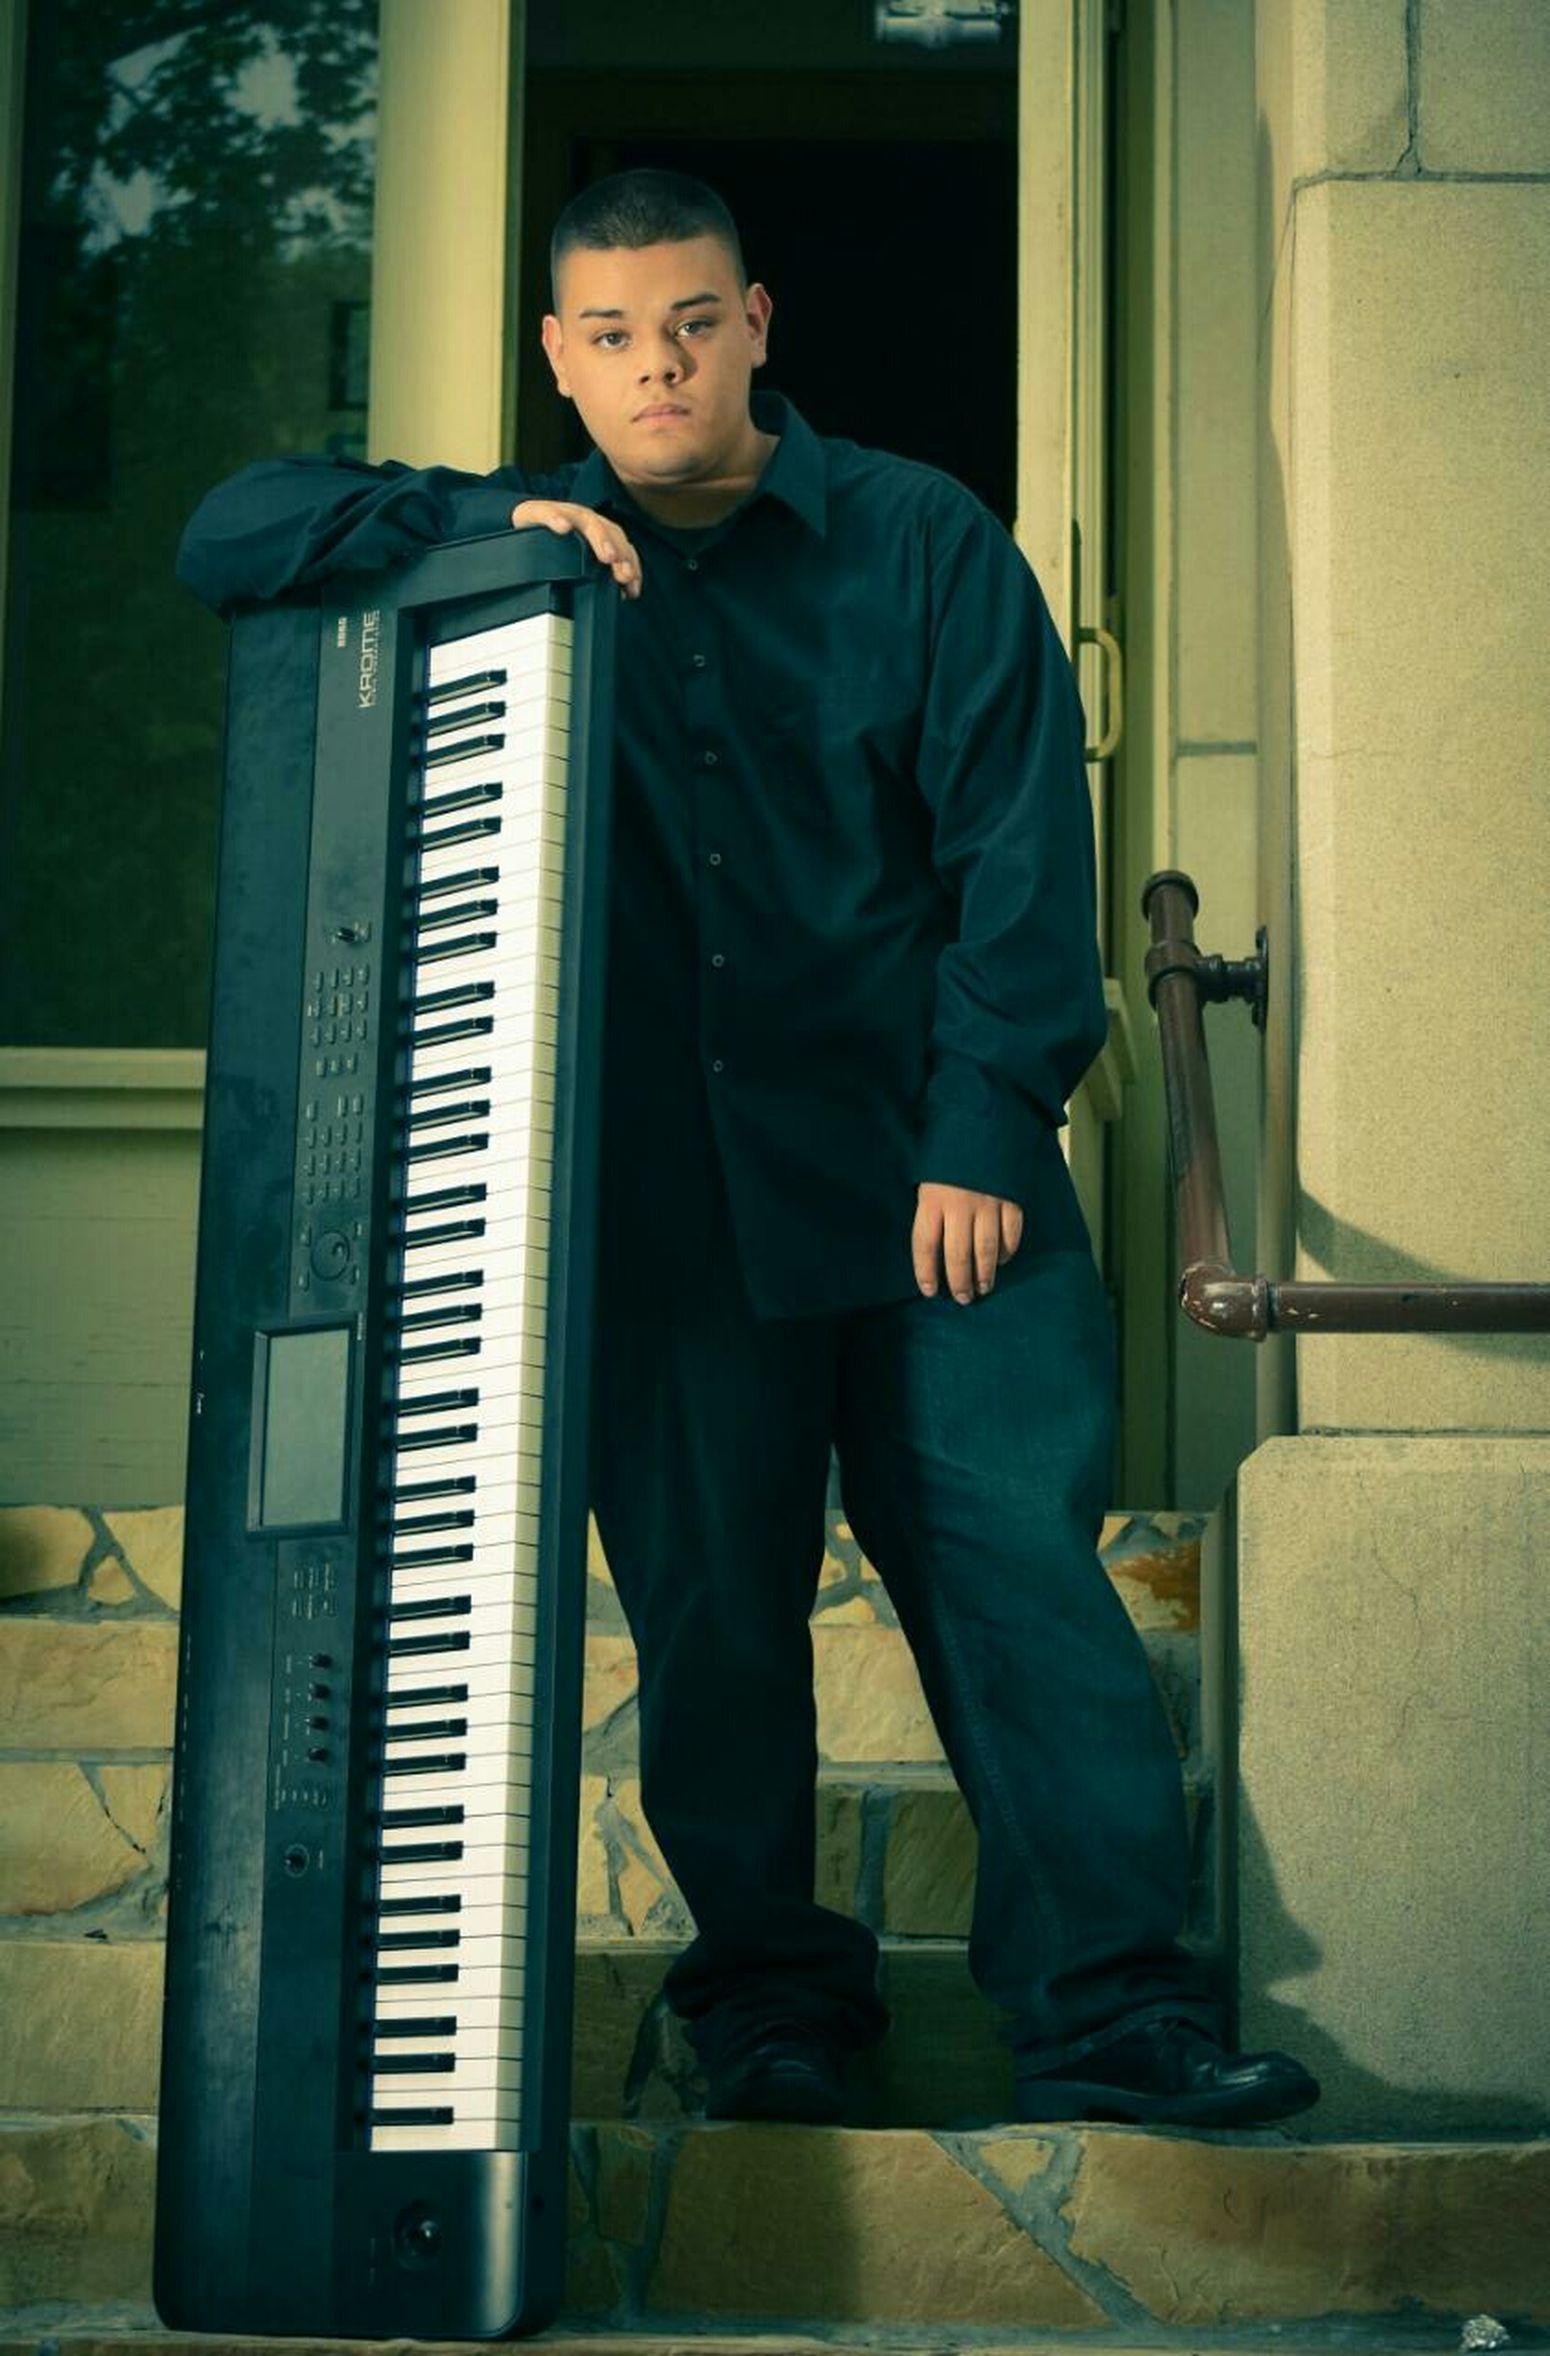 Church Musician Youth Im Apostolic APOSTOLICO Kansas City Kansas City Missouri  Letsplay AllforGod